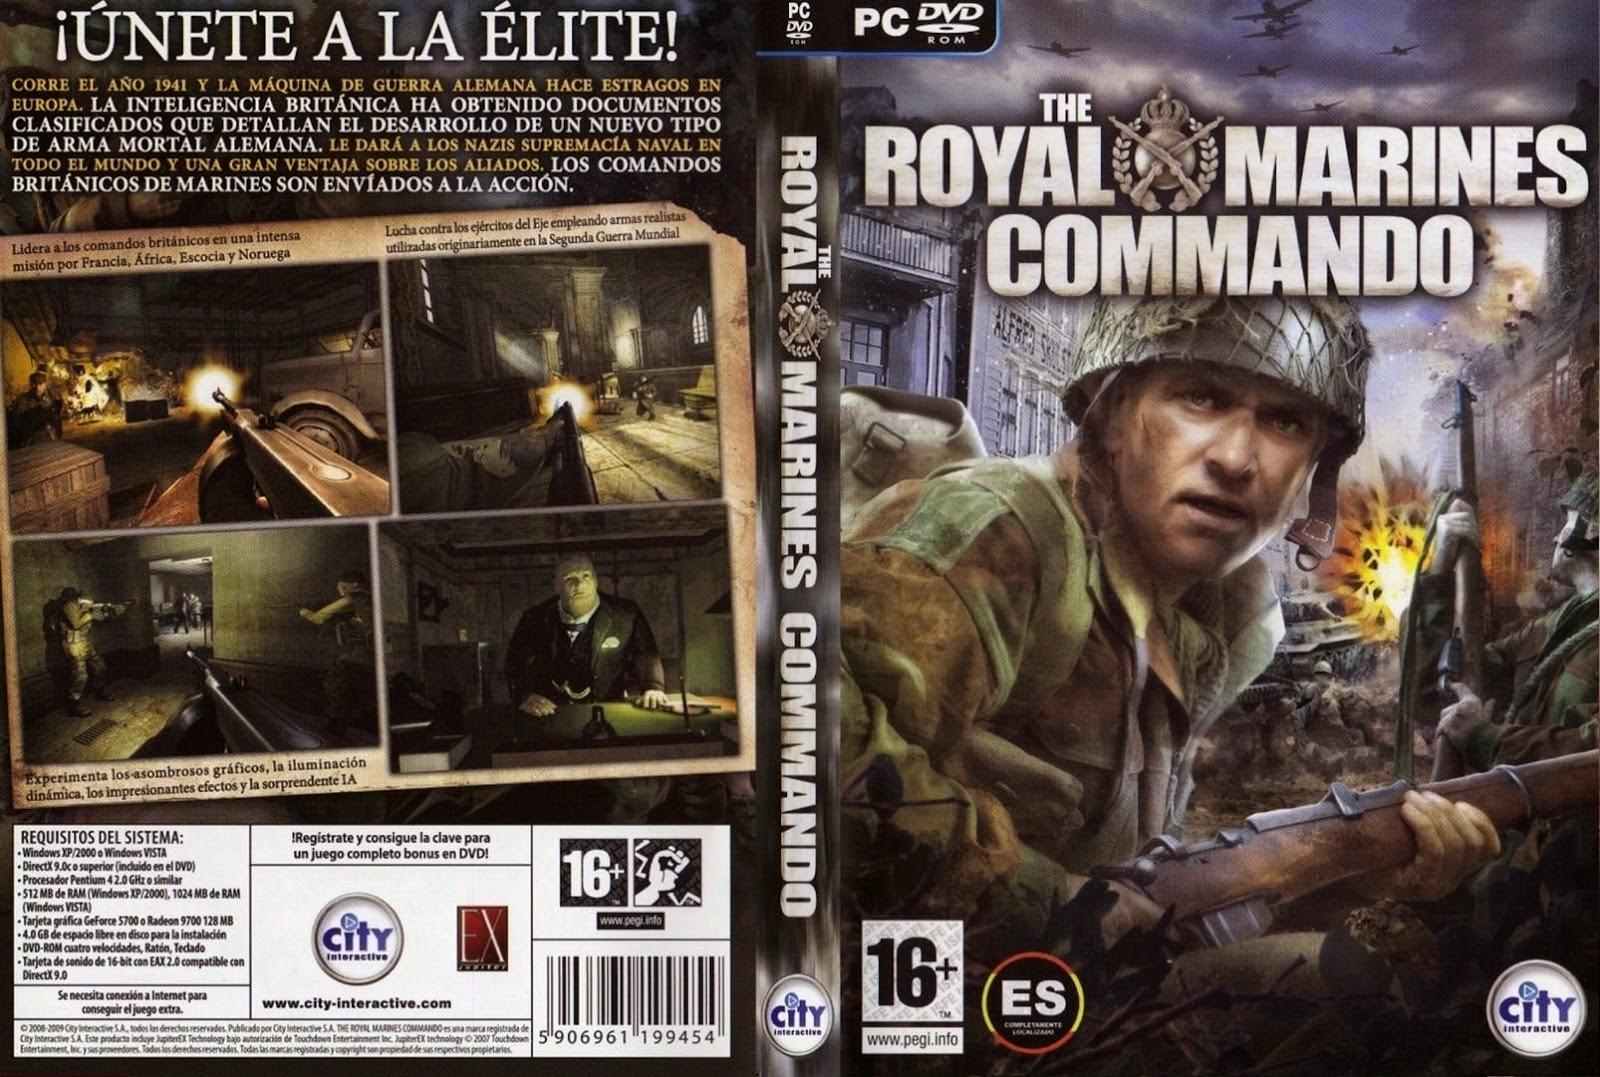 The Royal Marines Commando on Steam